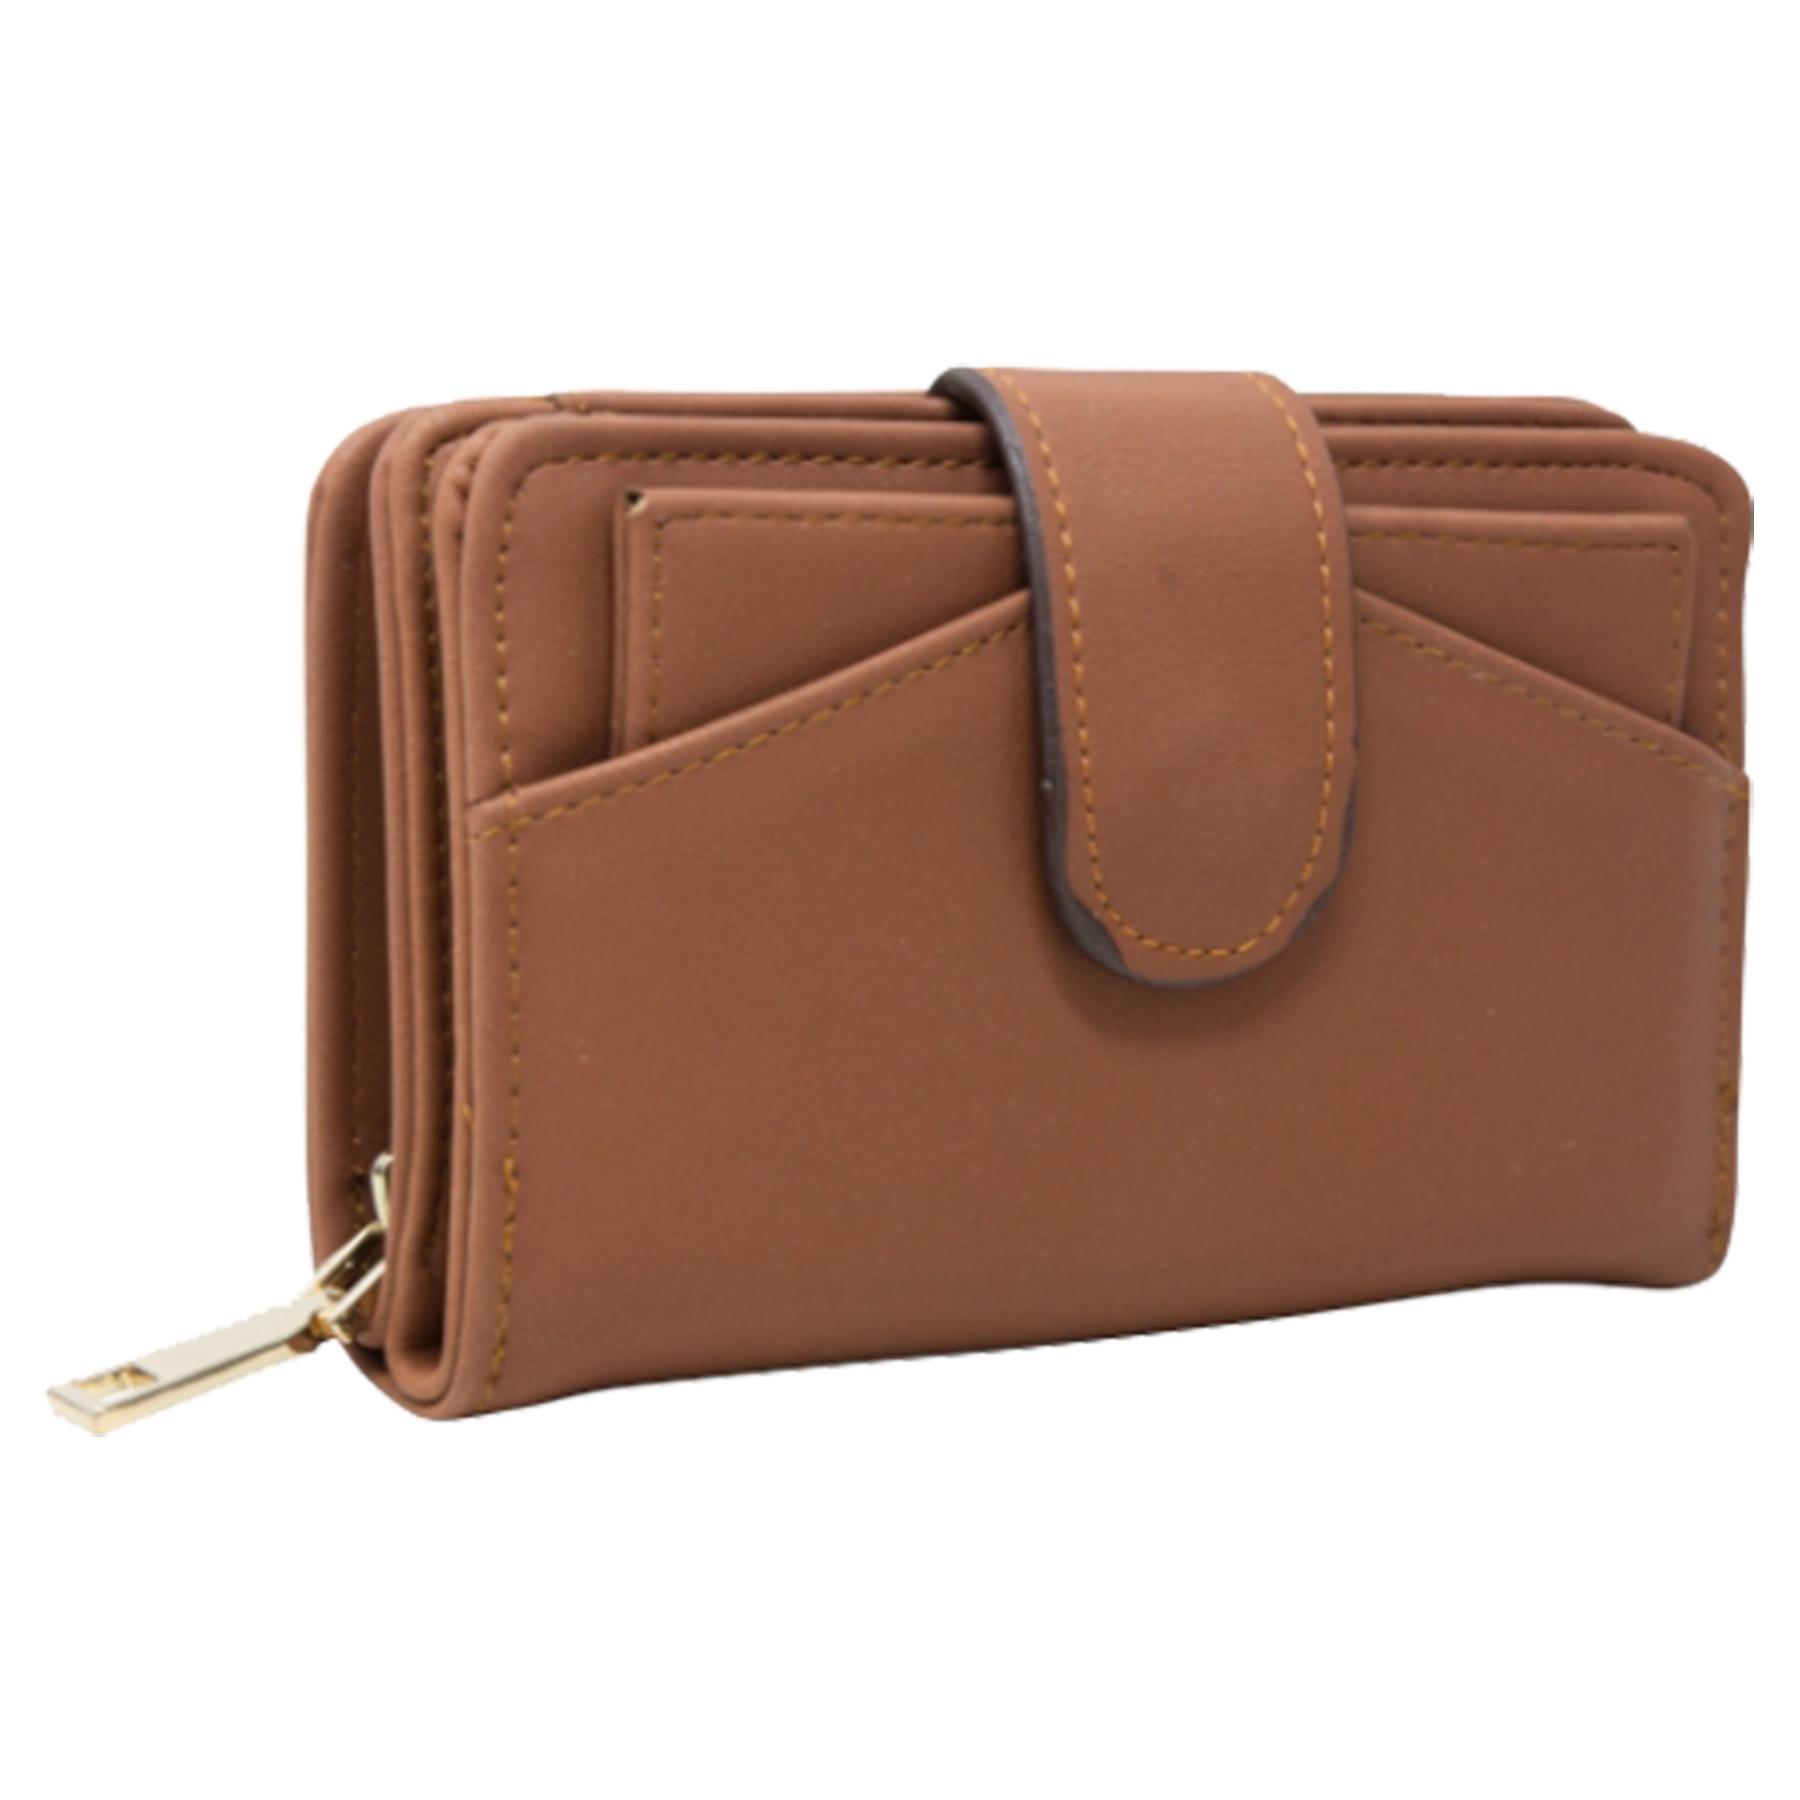 New-Ladies-Card-Slots-Zipped-Pocket-Faux-Leather-Basic-Wallet-Purse thumbnail 10